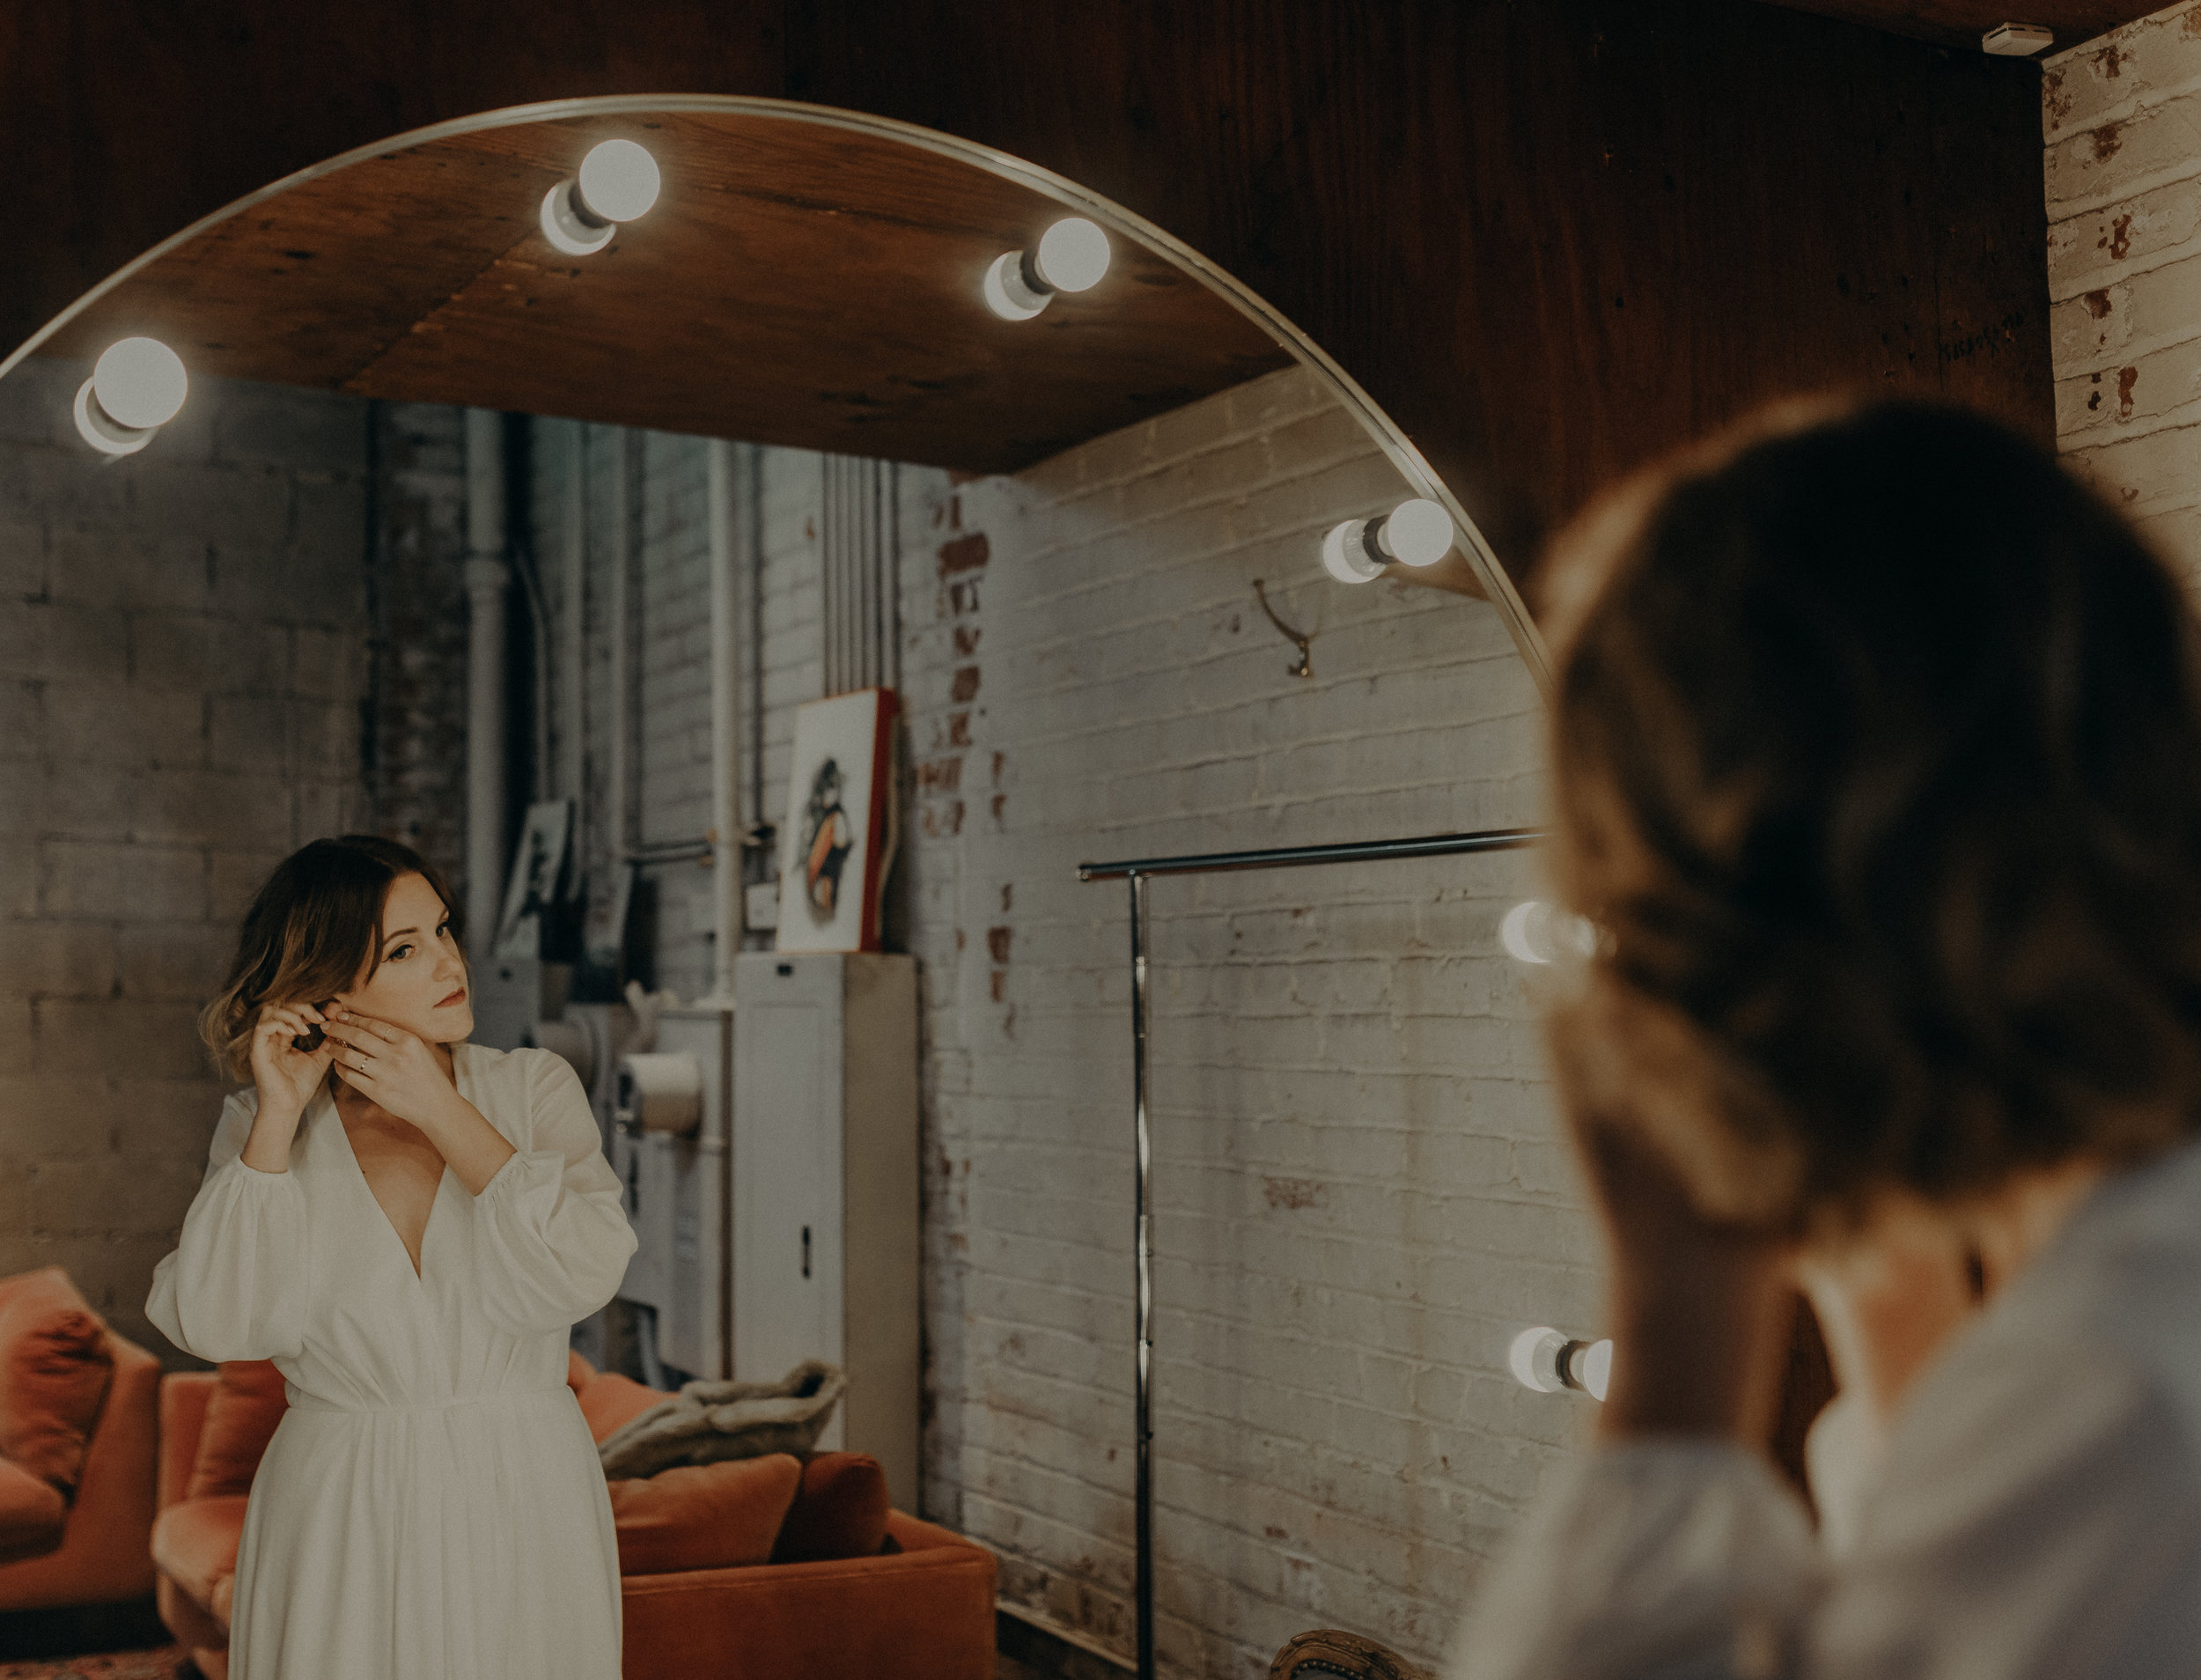 Isaiah + Taylor Photography - Reese + Jonathan Wedding-001.jpg